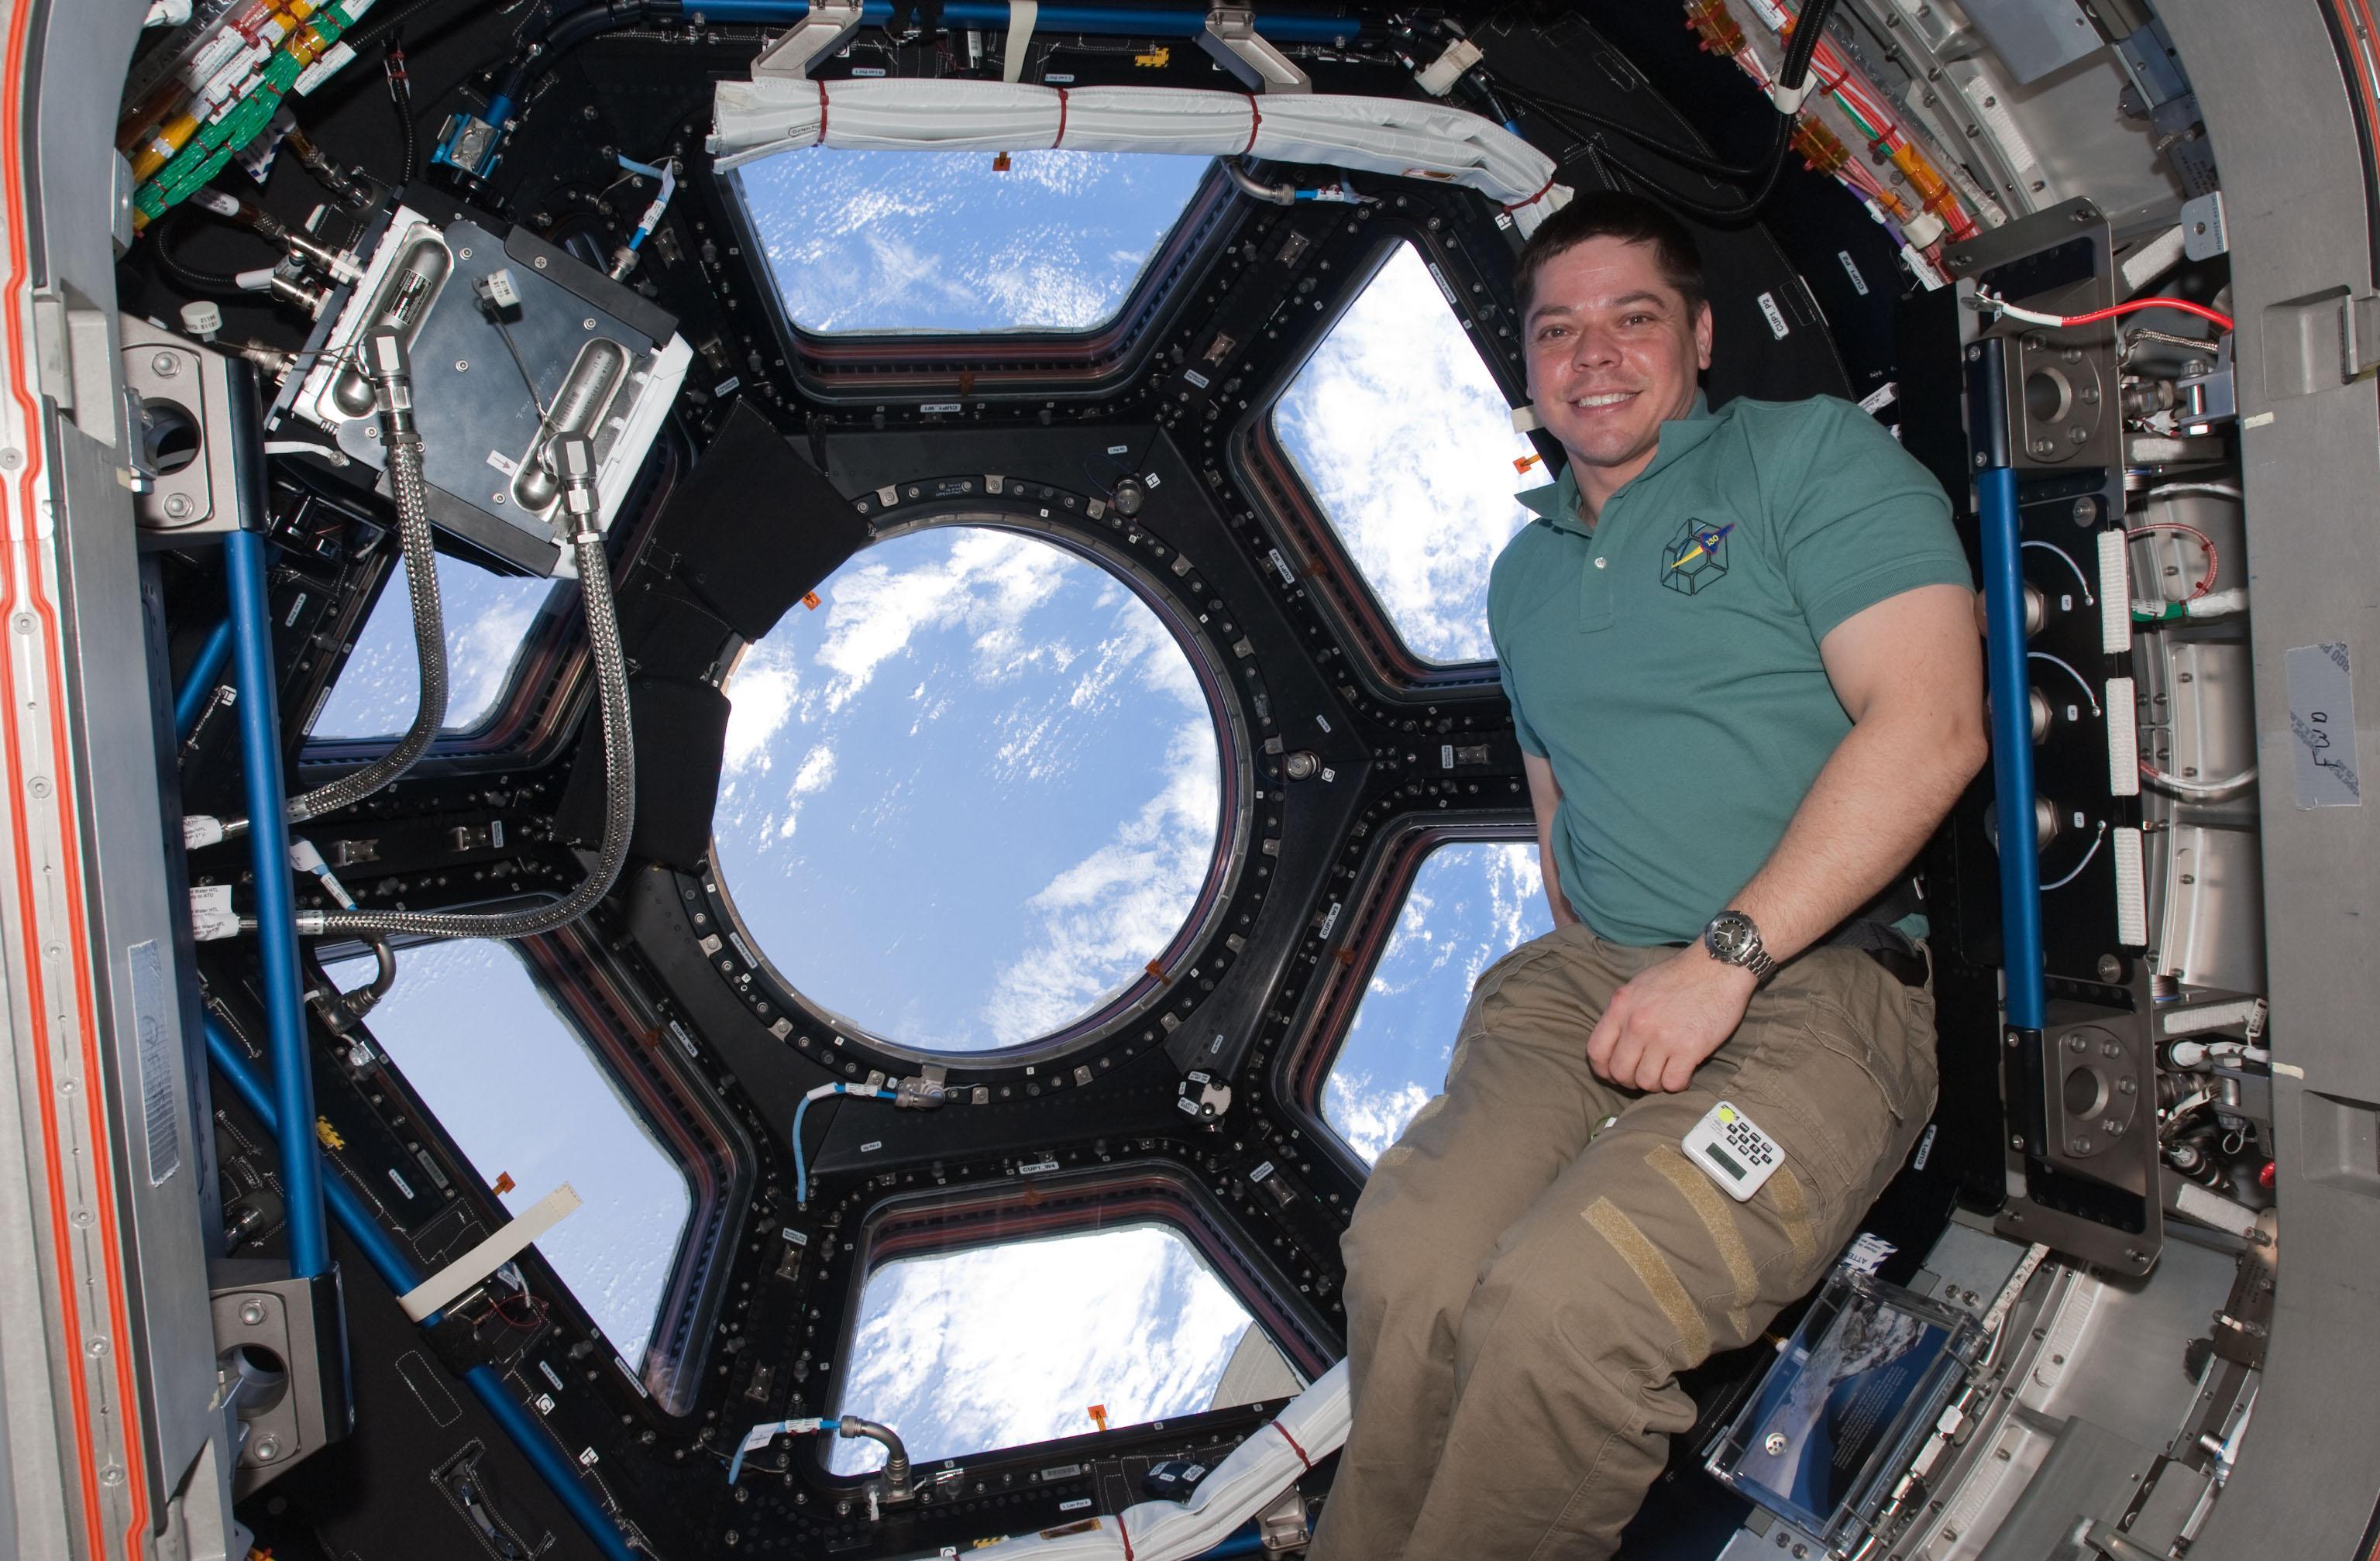 Iss Backyard Viewing : Spaceweathercom Time Machine